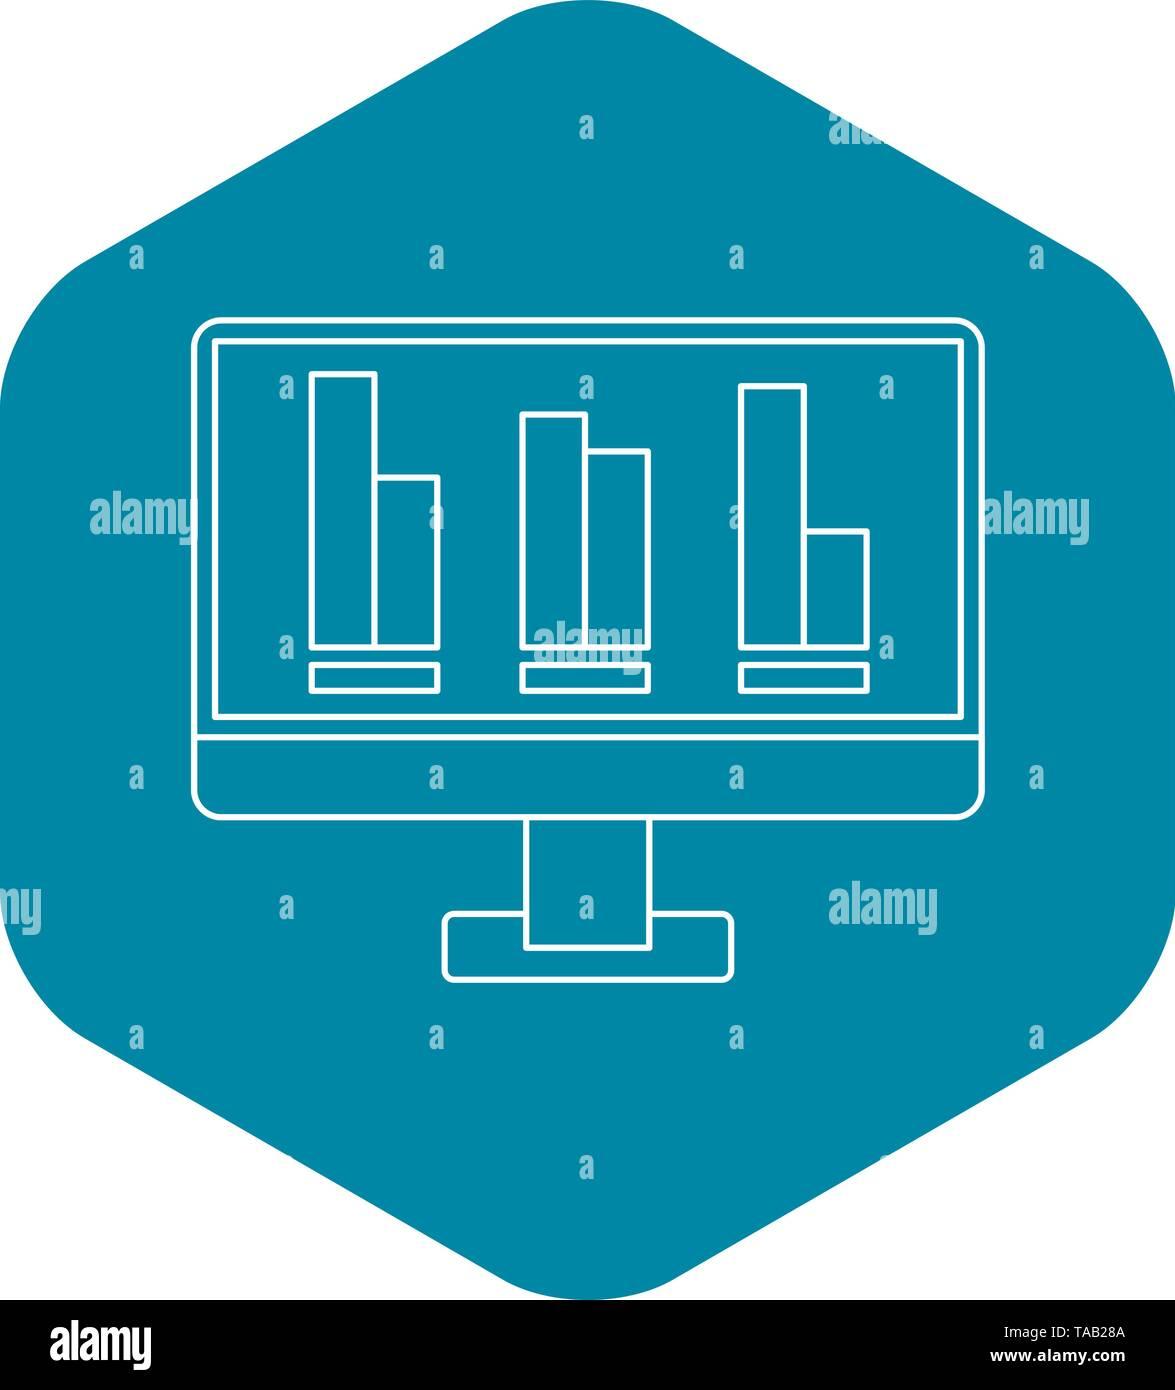 Wachsende Business-Grafik am Computer-Bildschirm-Symbol Stockbild